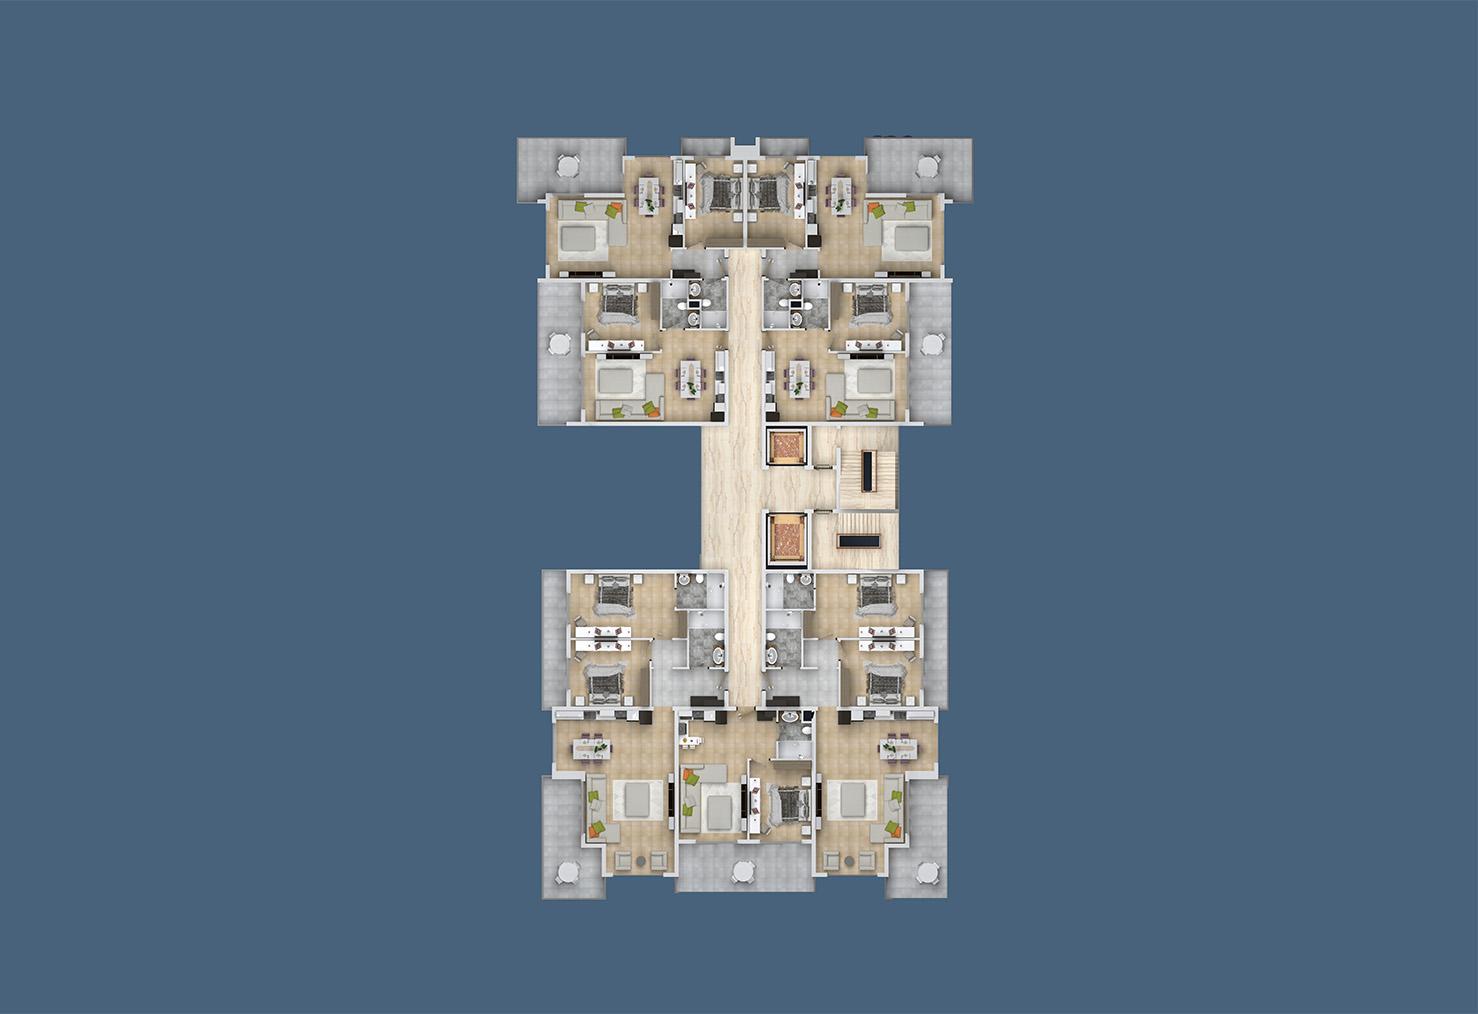 План расположения квартир 3 этаж C Yekta Kingdom Trade Center